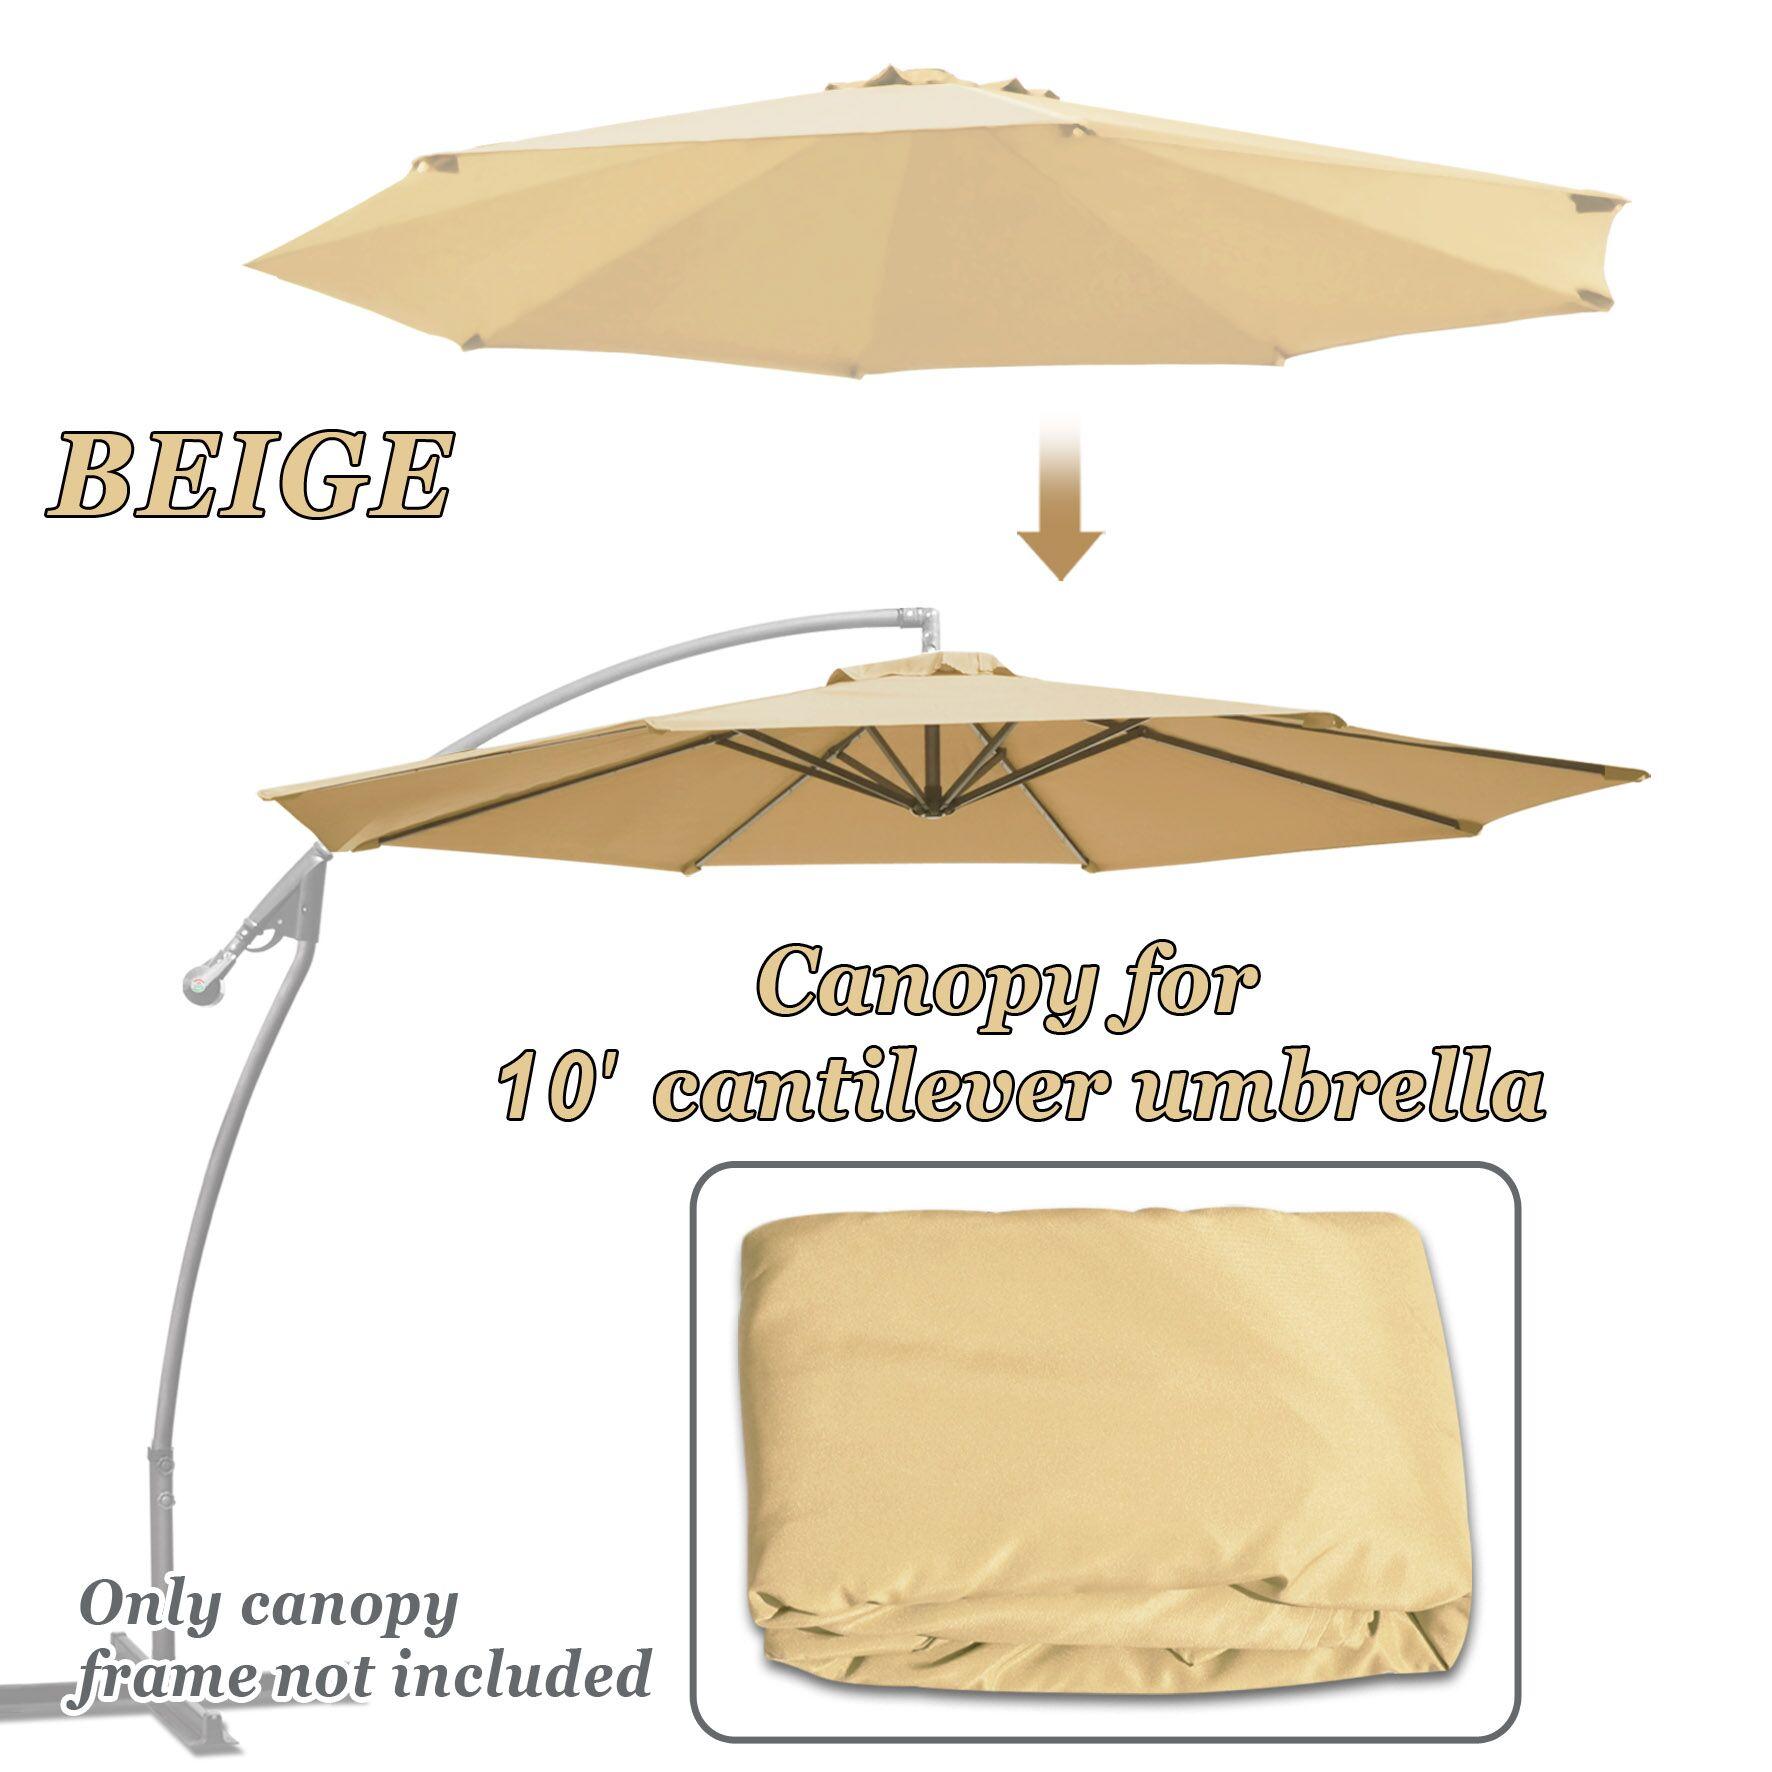 Lochlan 10' Patio Umbrella Cover Color: Beige